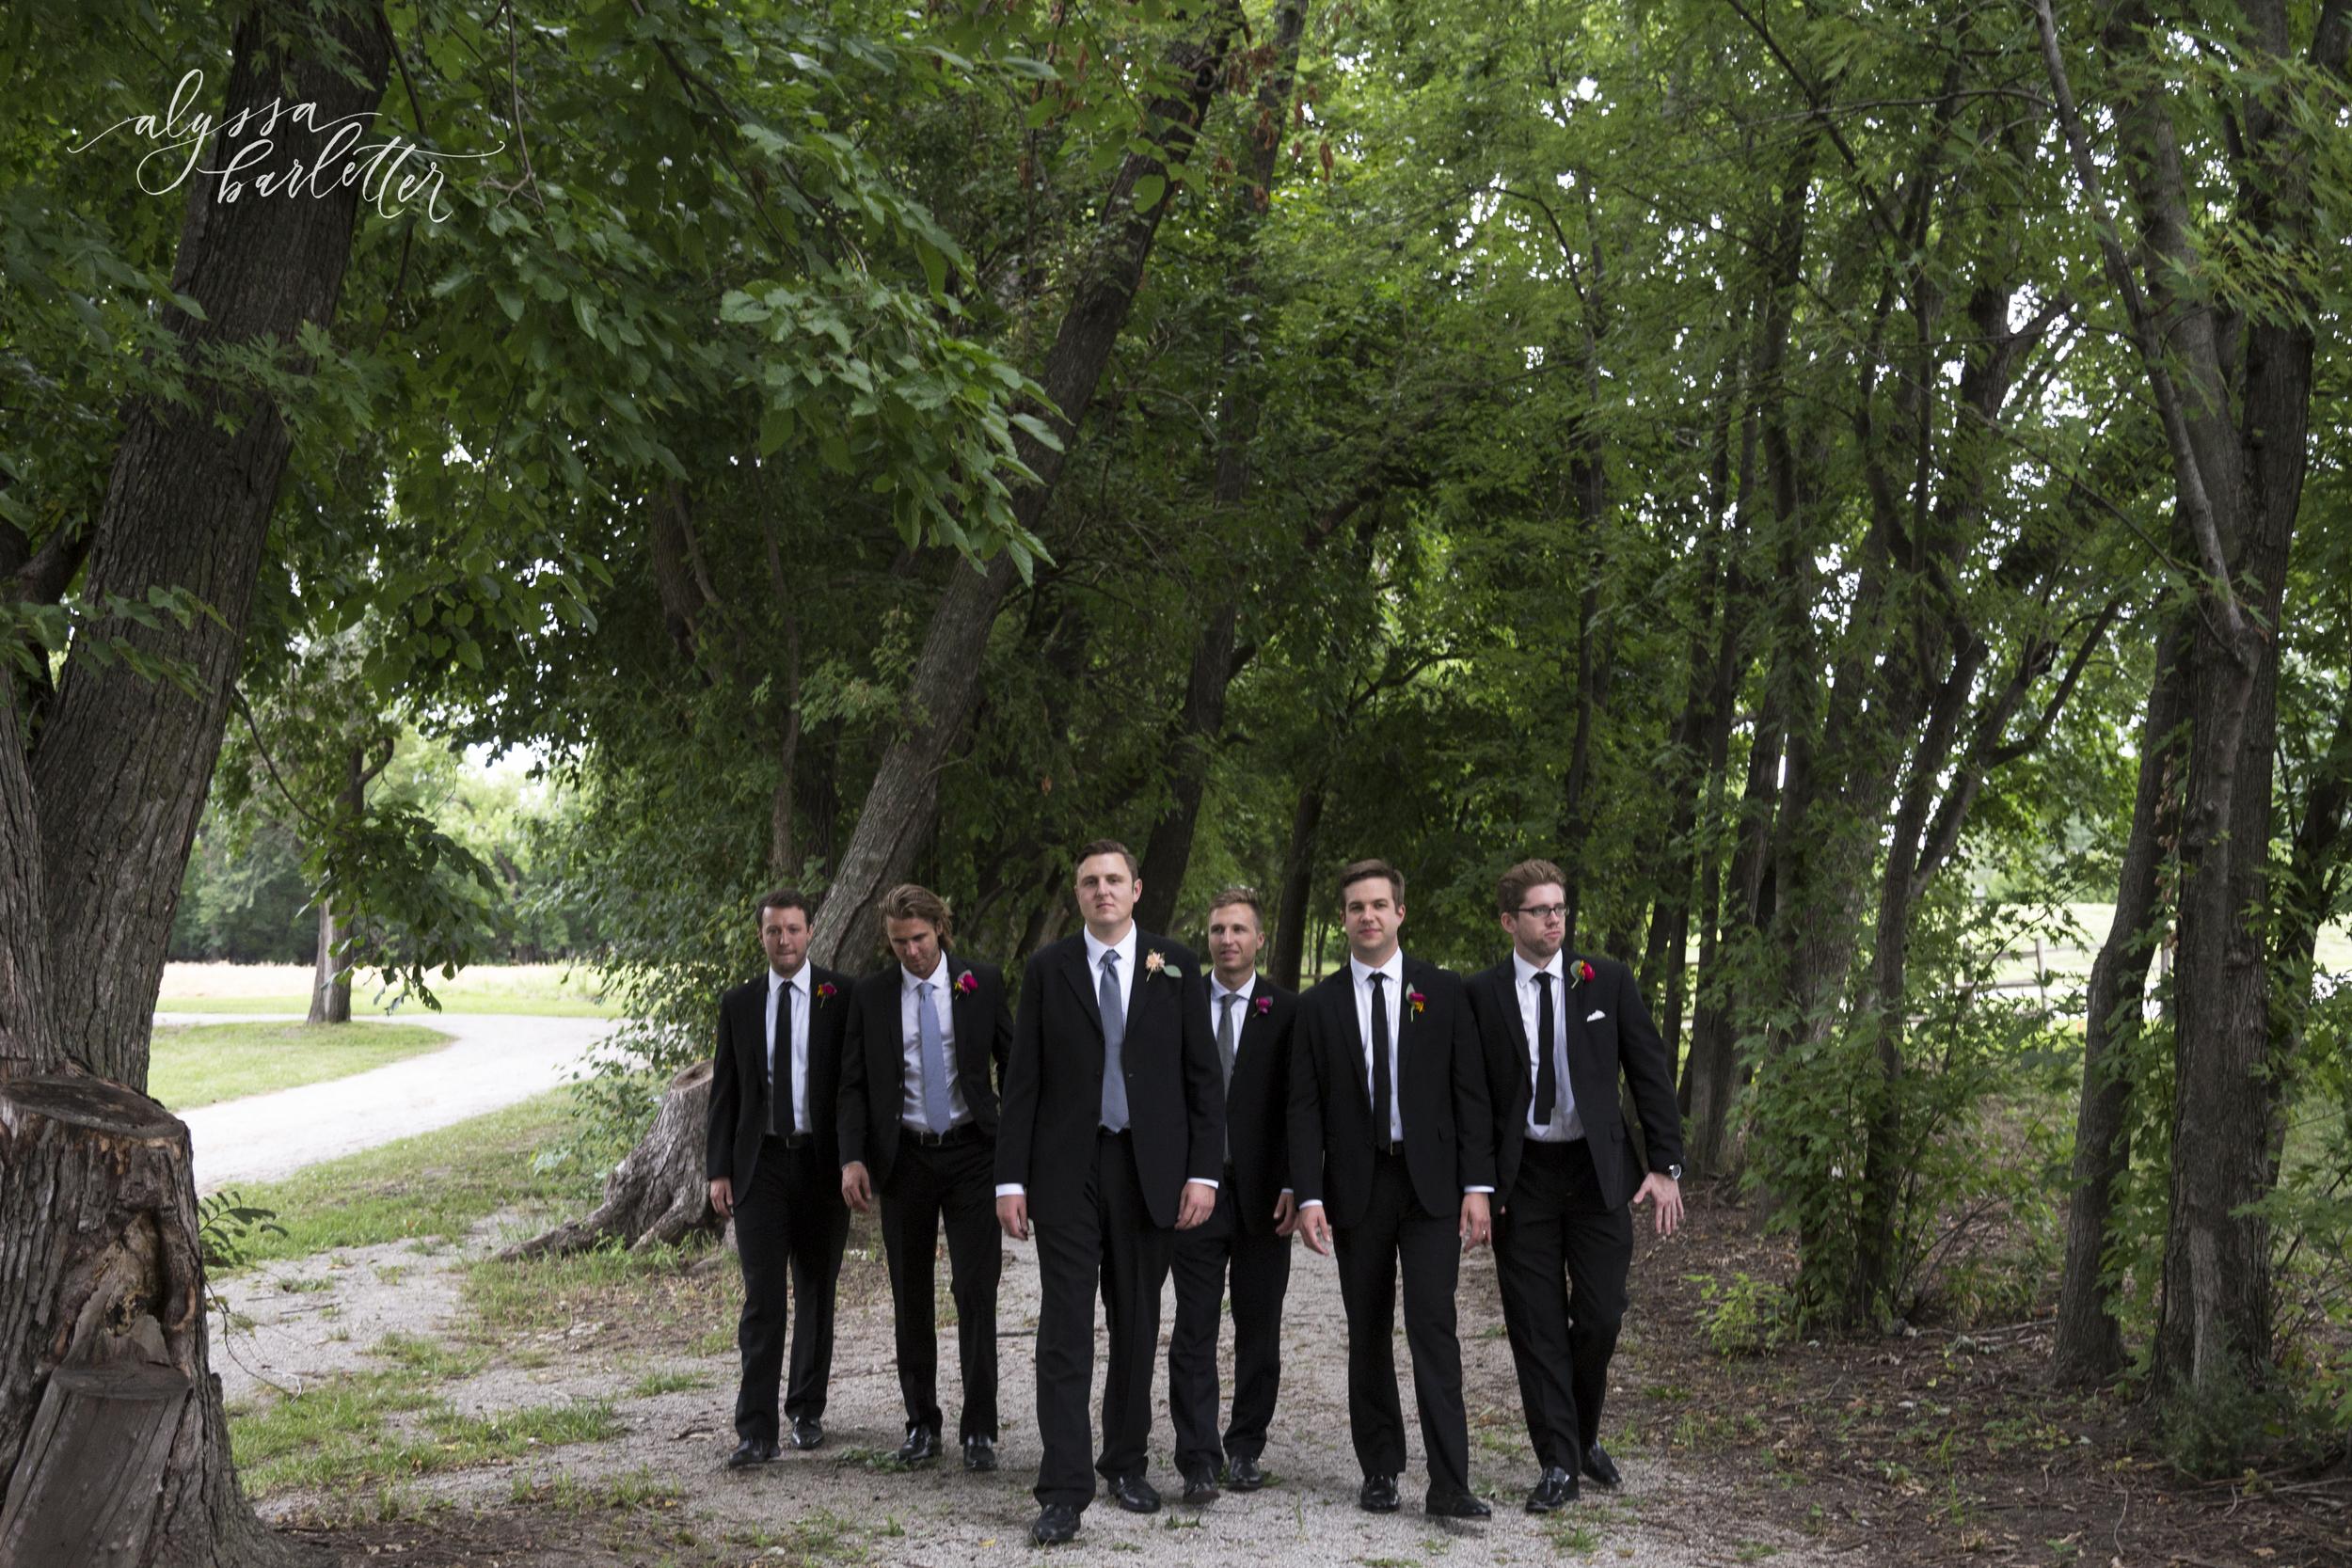 kansas city wedding budget mahaffie groom groomsmen suits